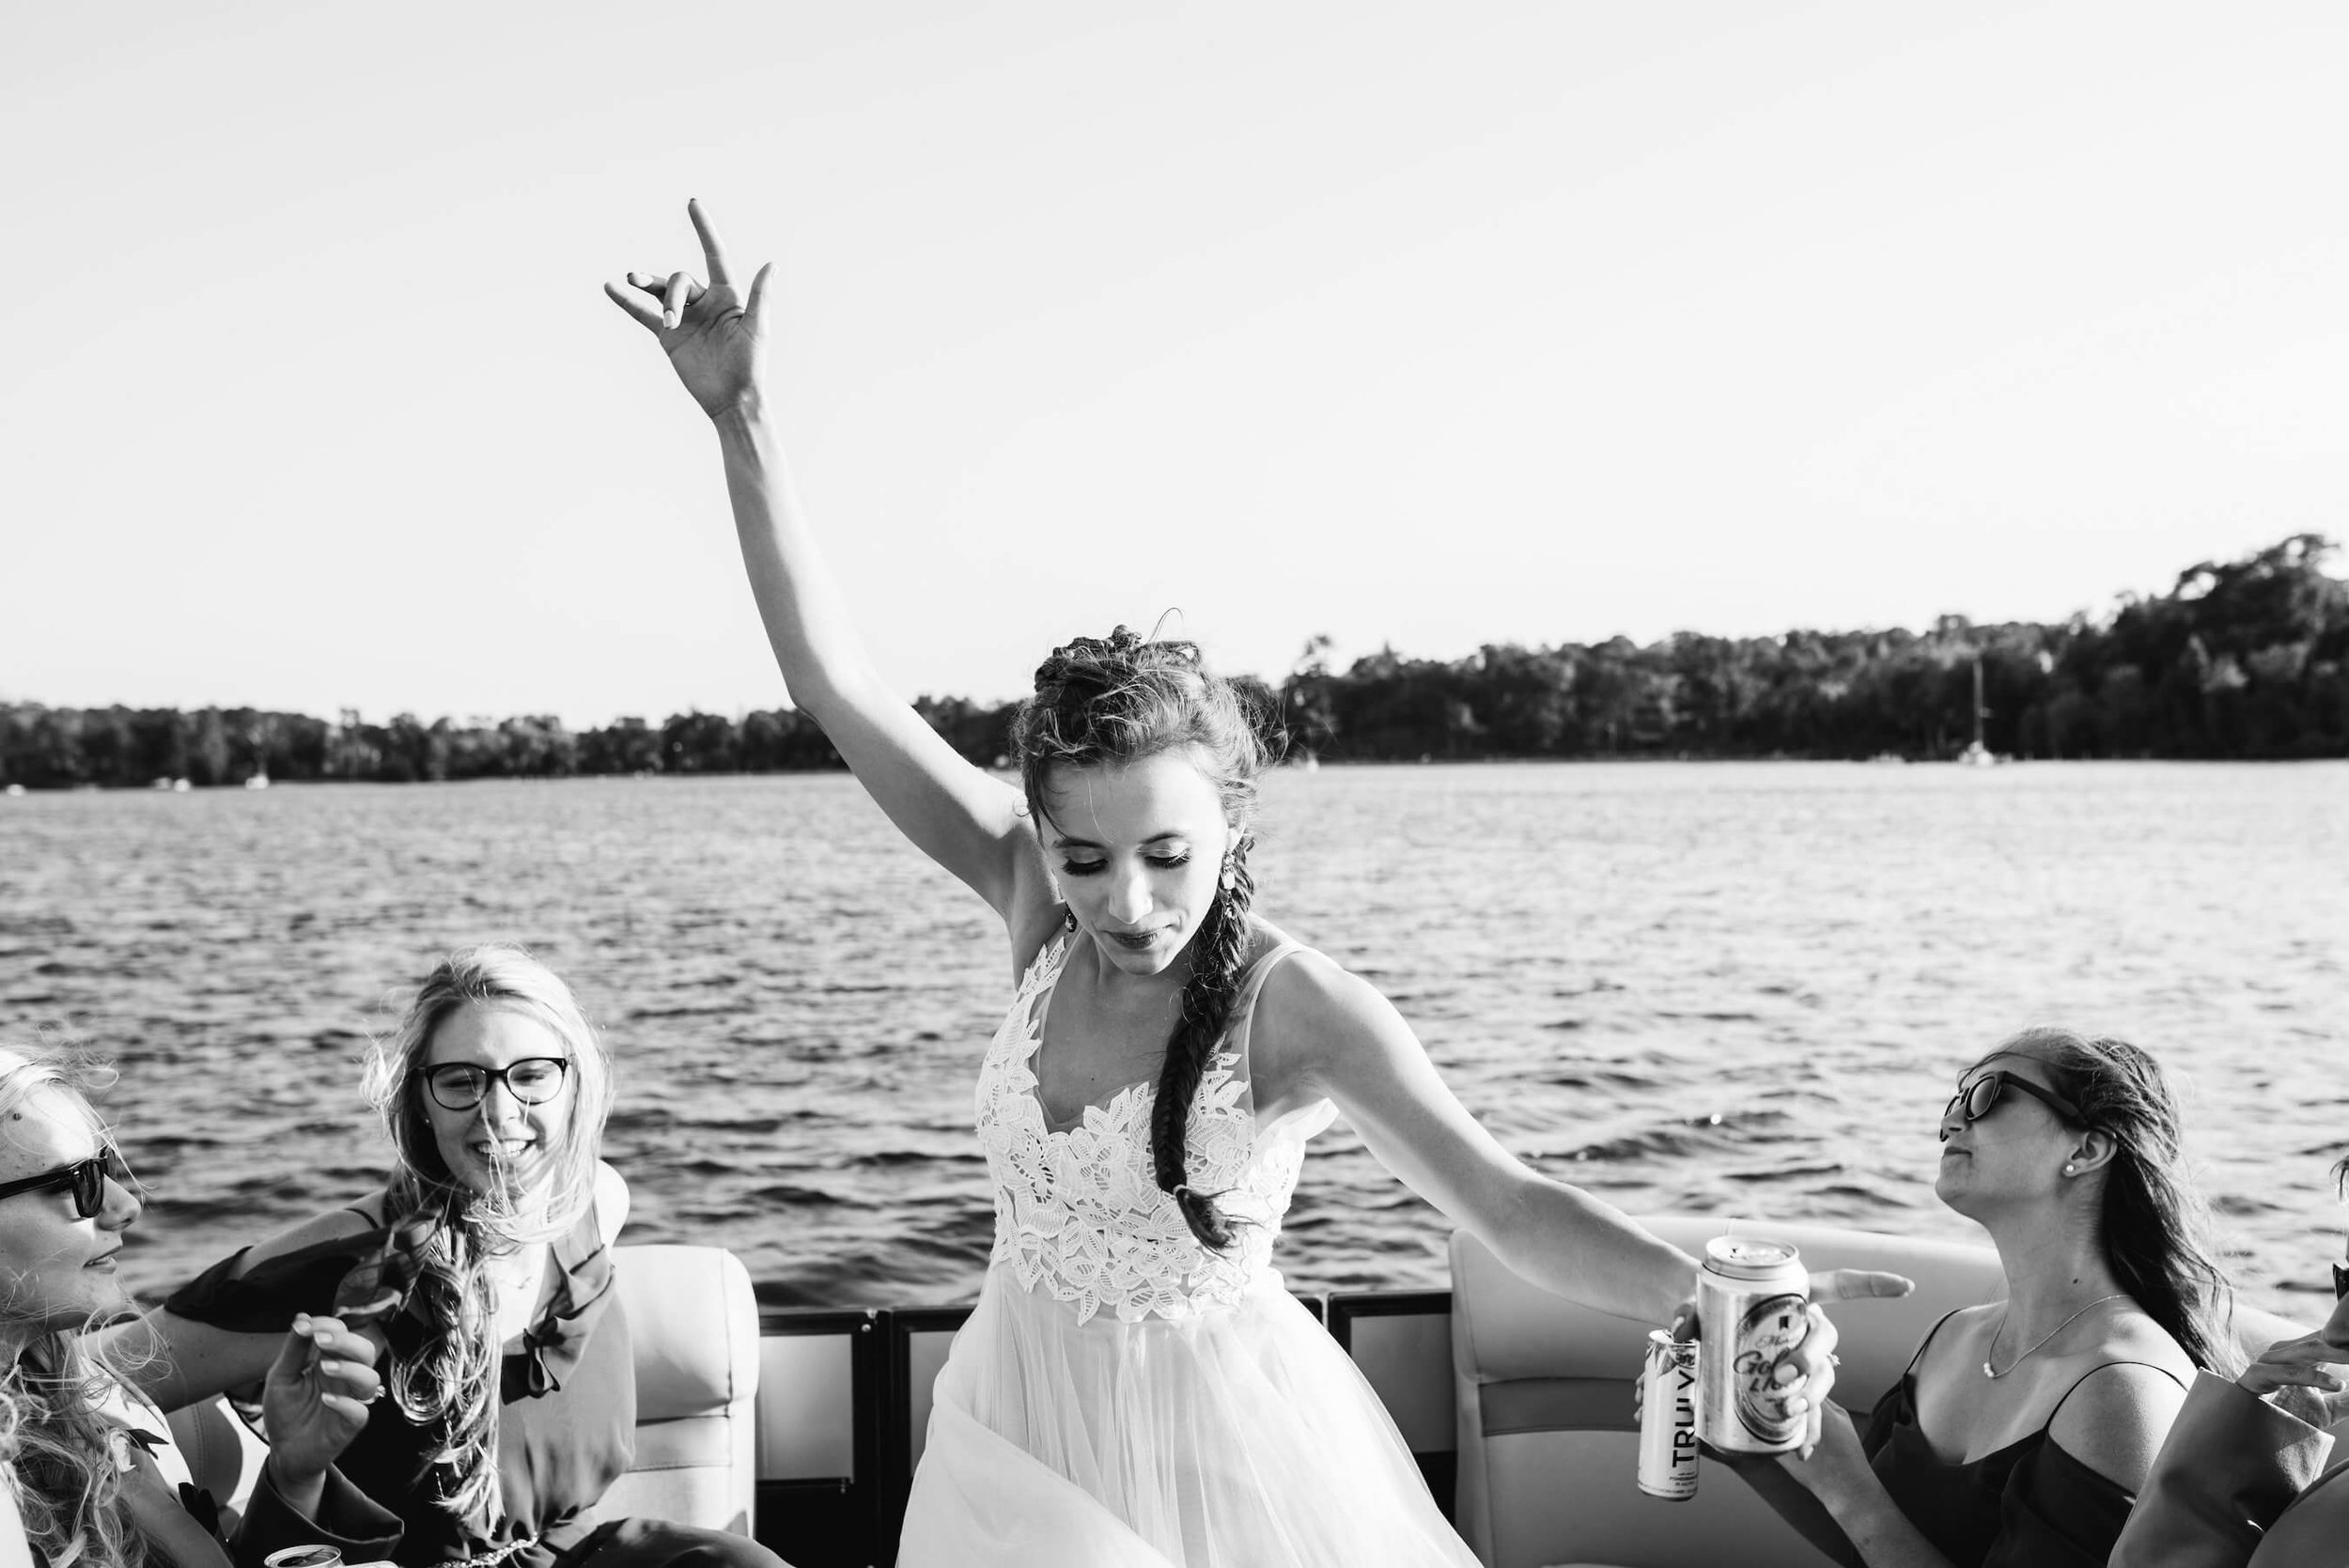 engle-olson-wedding-blair-taylor-34.jpg